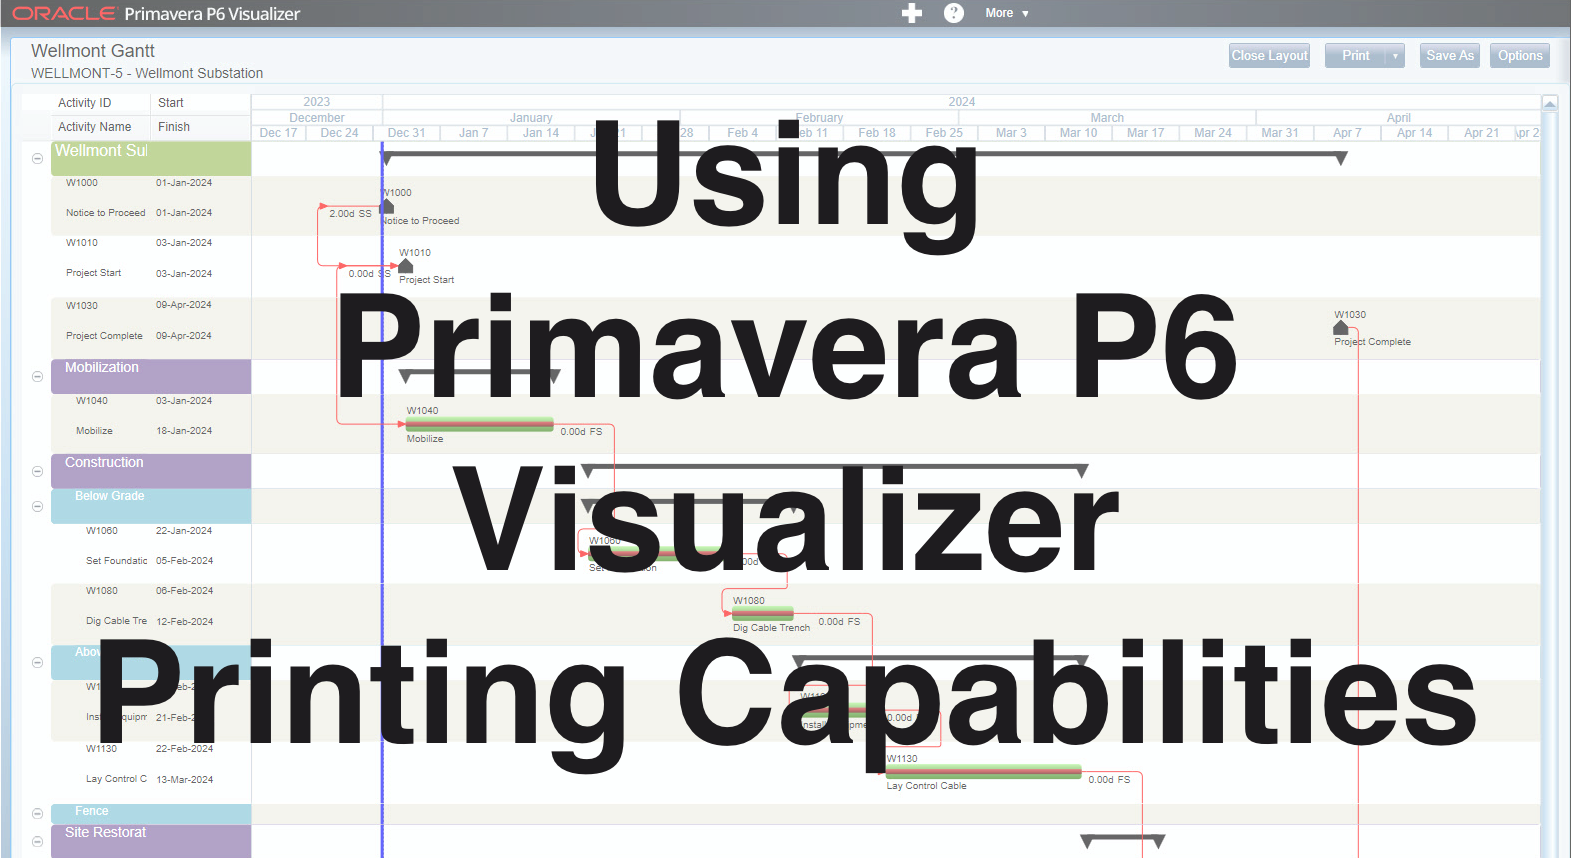 Primavera P6 Visualizer Printing Capabilities